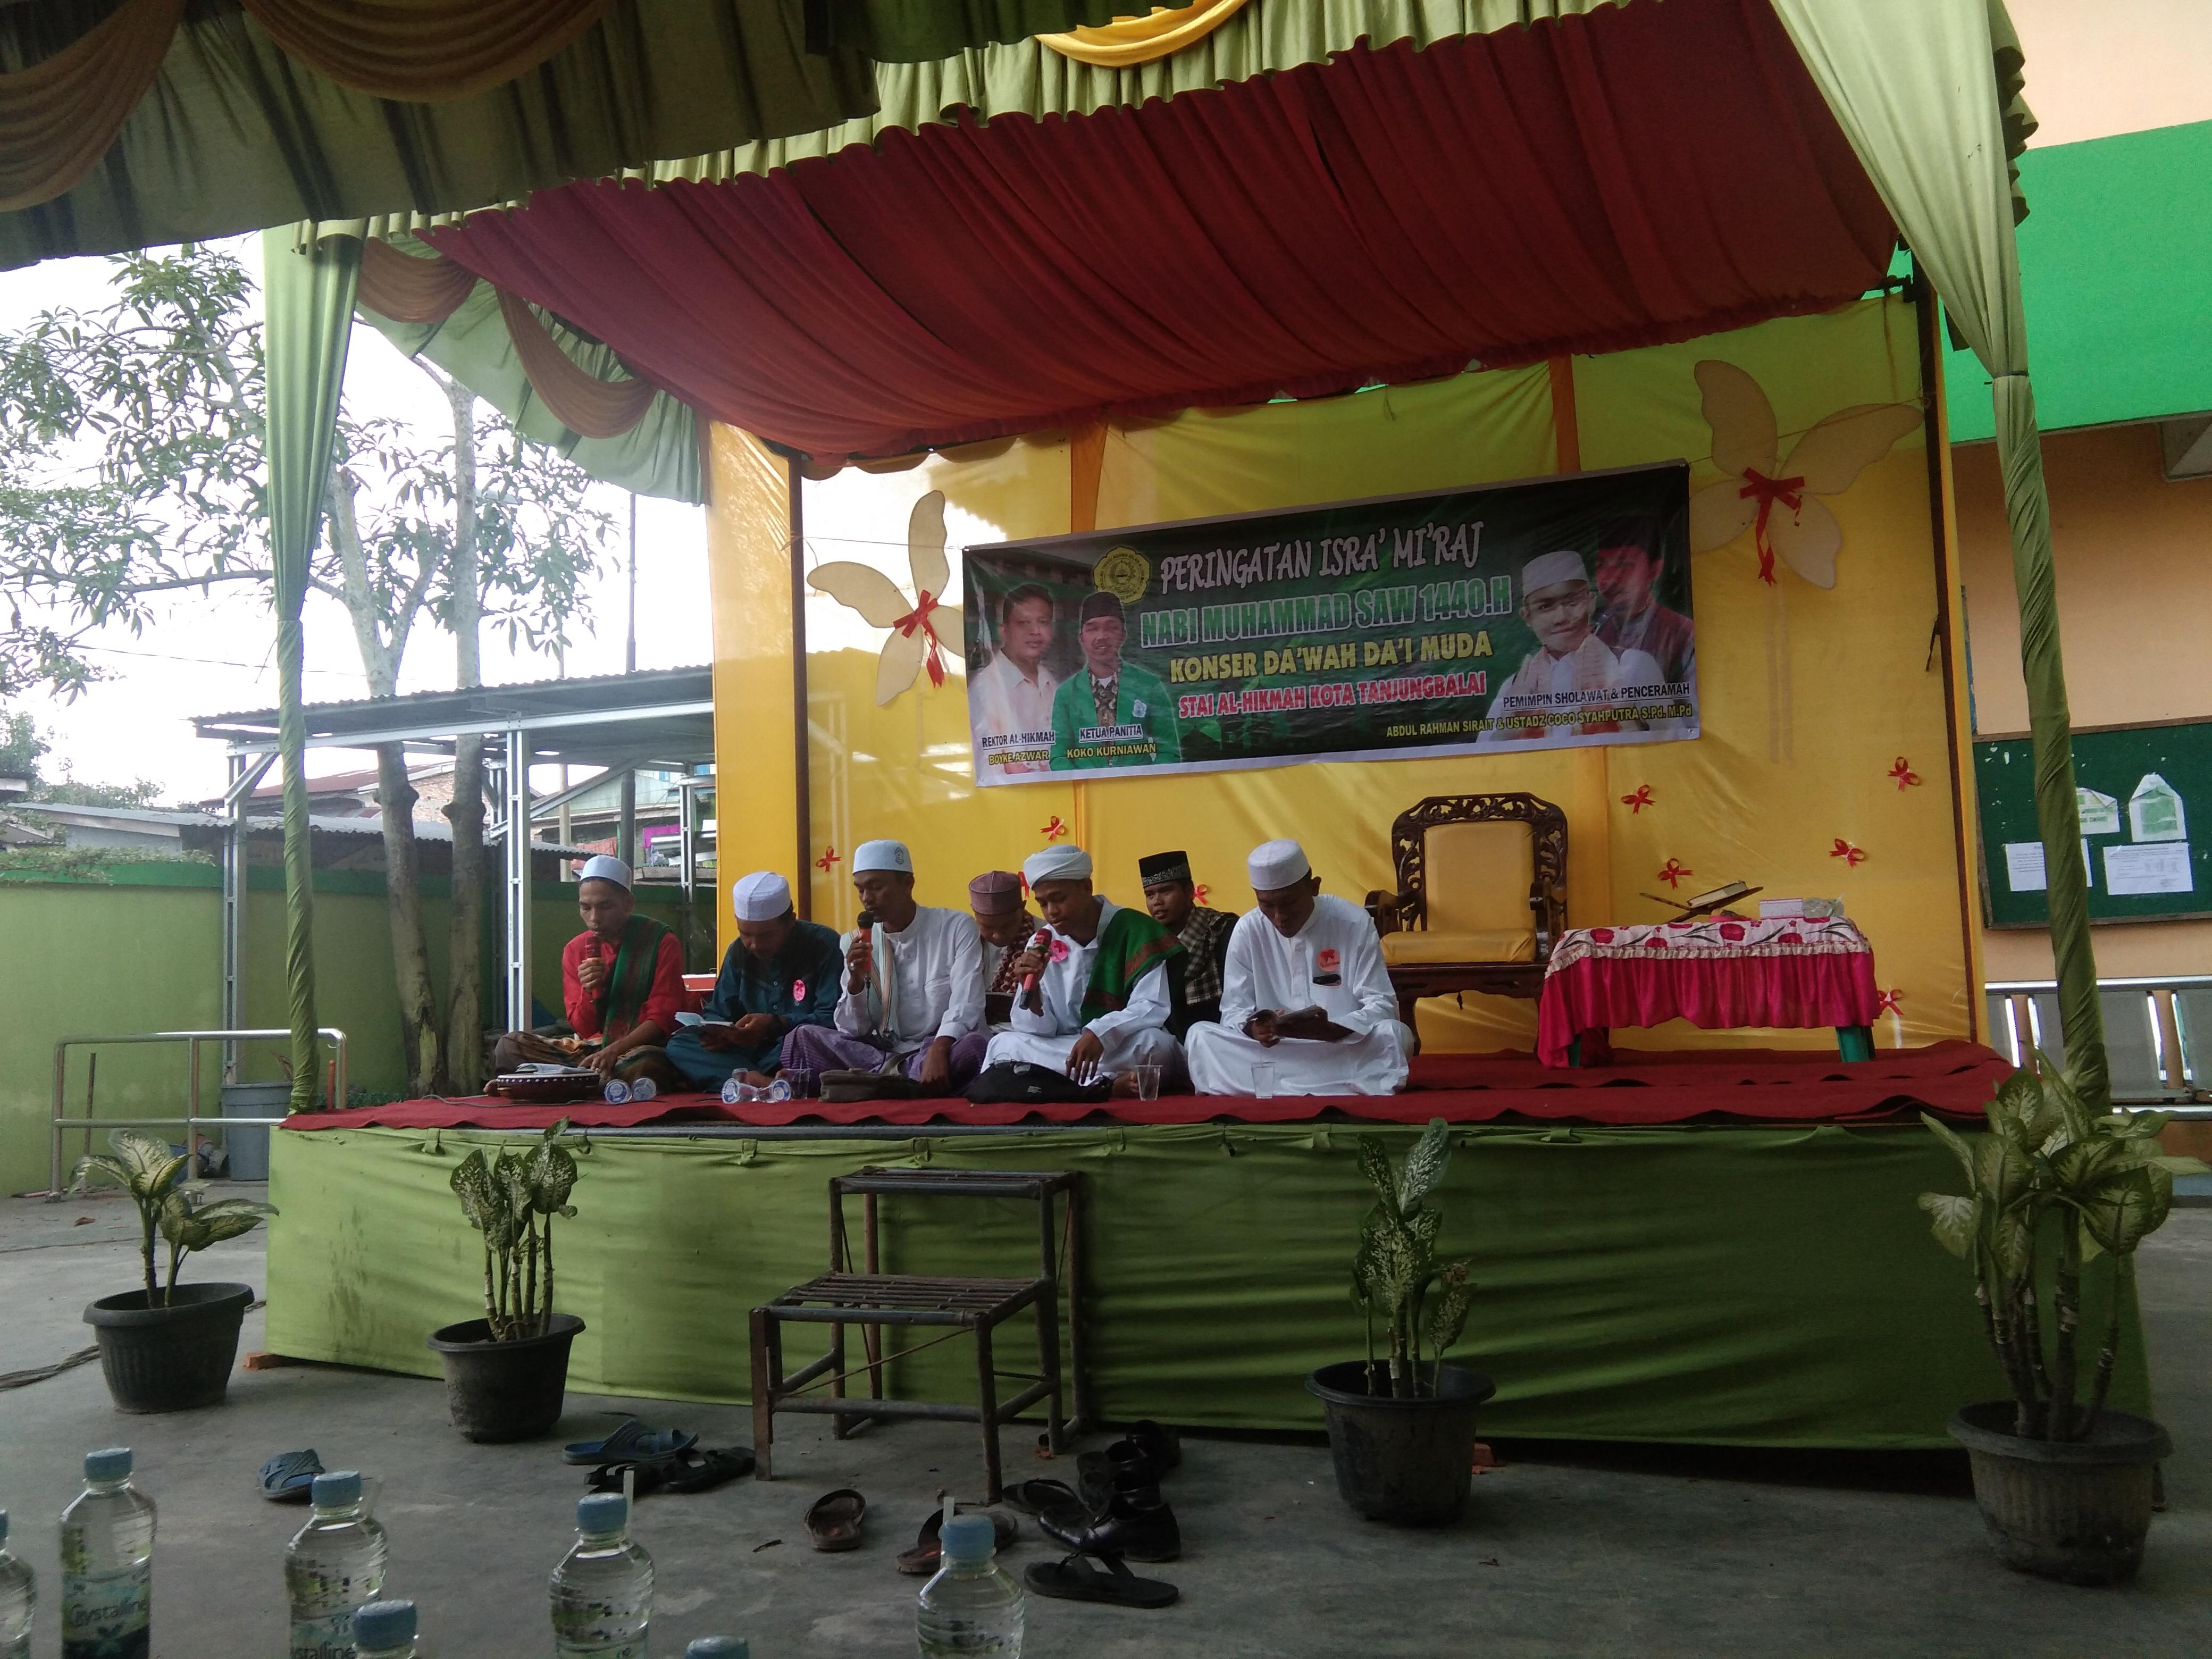 Peringatan Isra' Mi'raj Nabi Muhammad SAW 1440 H di Kampus STAI Al-Hikmah Tanjungbalai